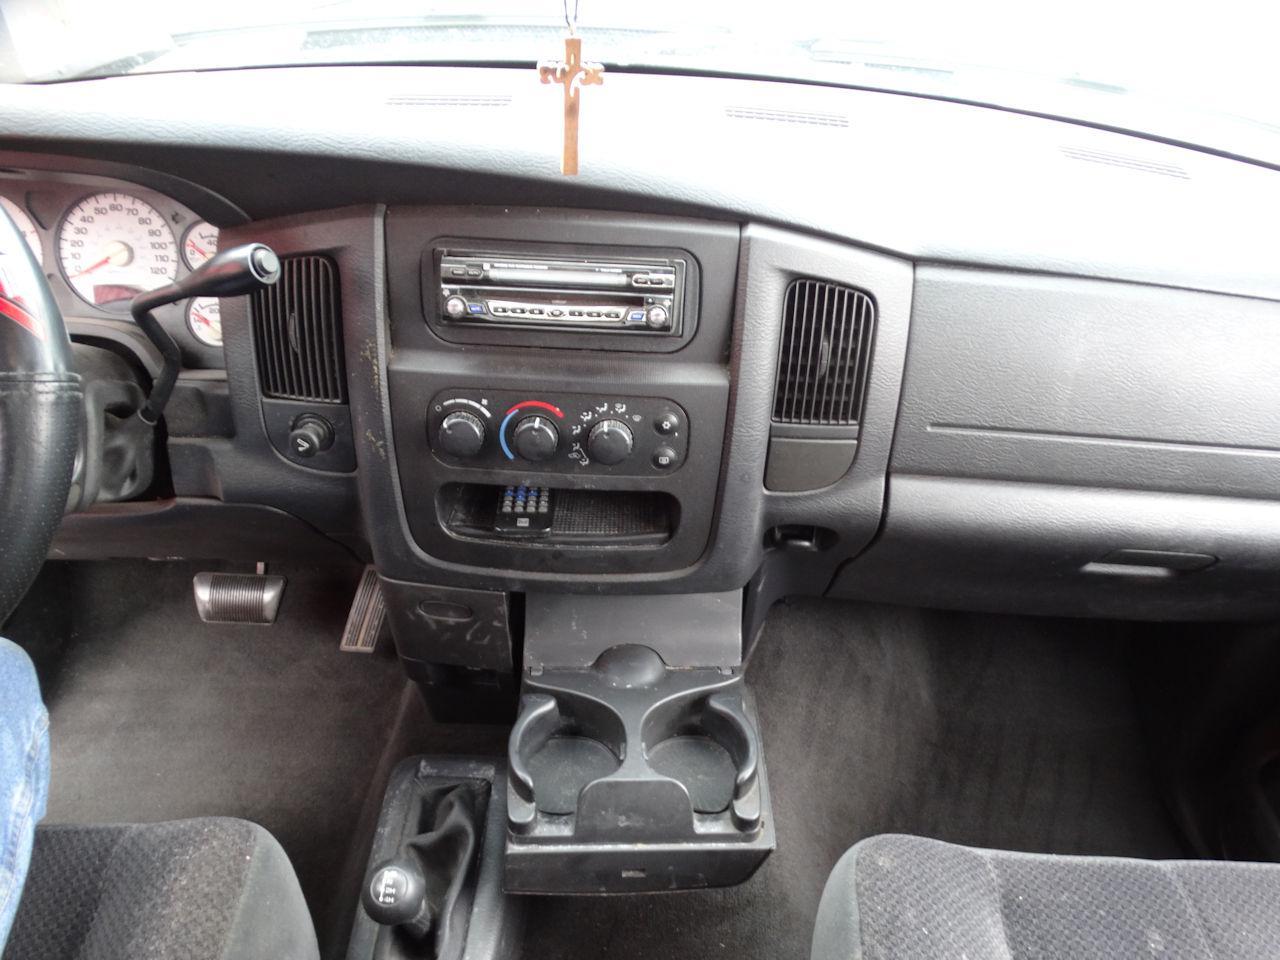 2005 Dodge Ram 72